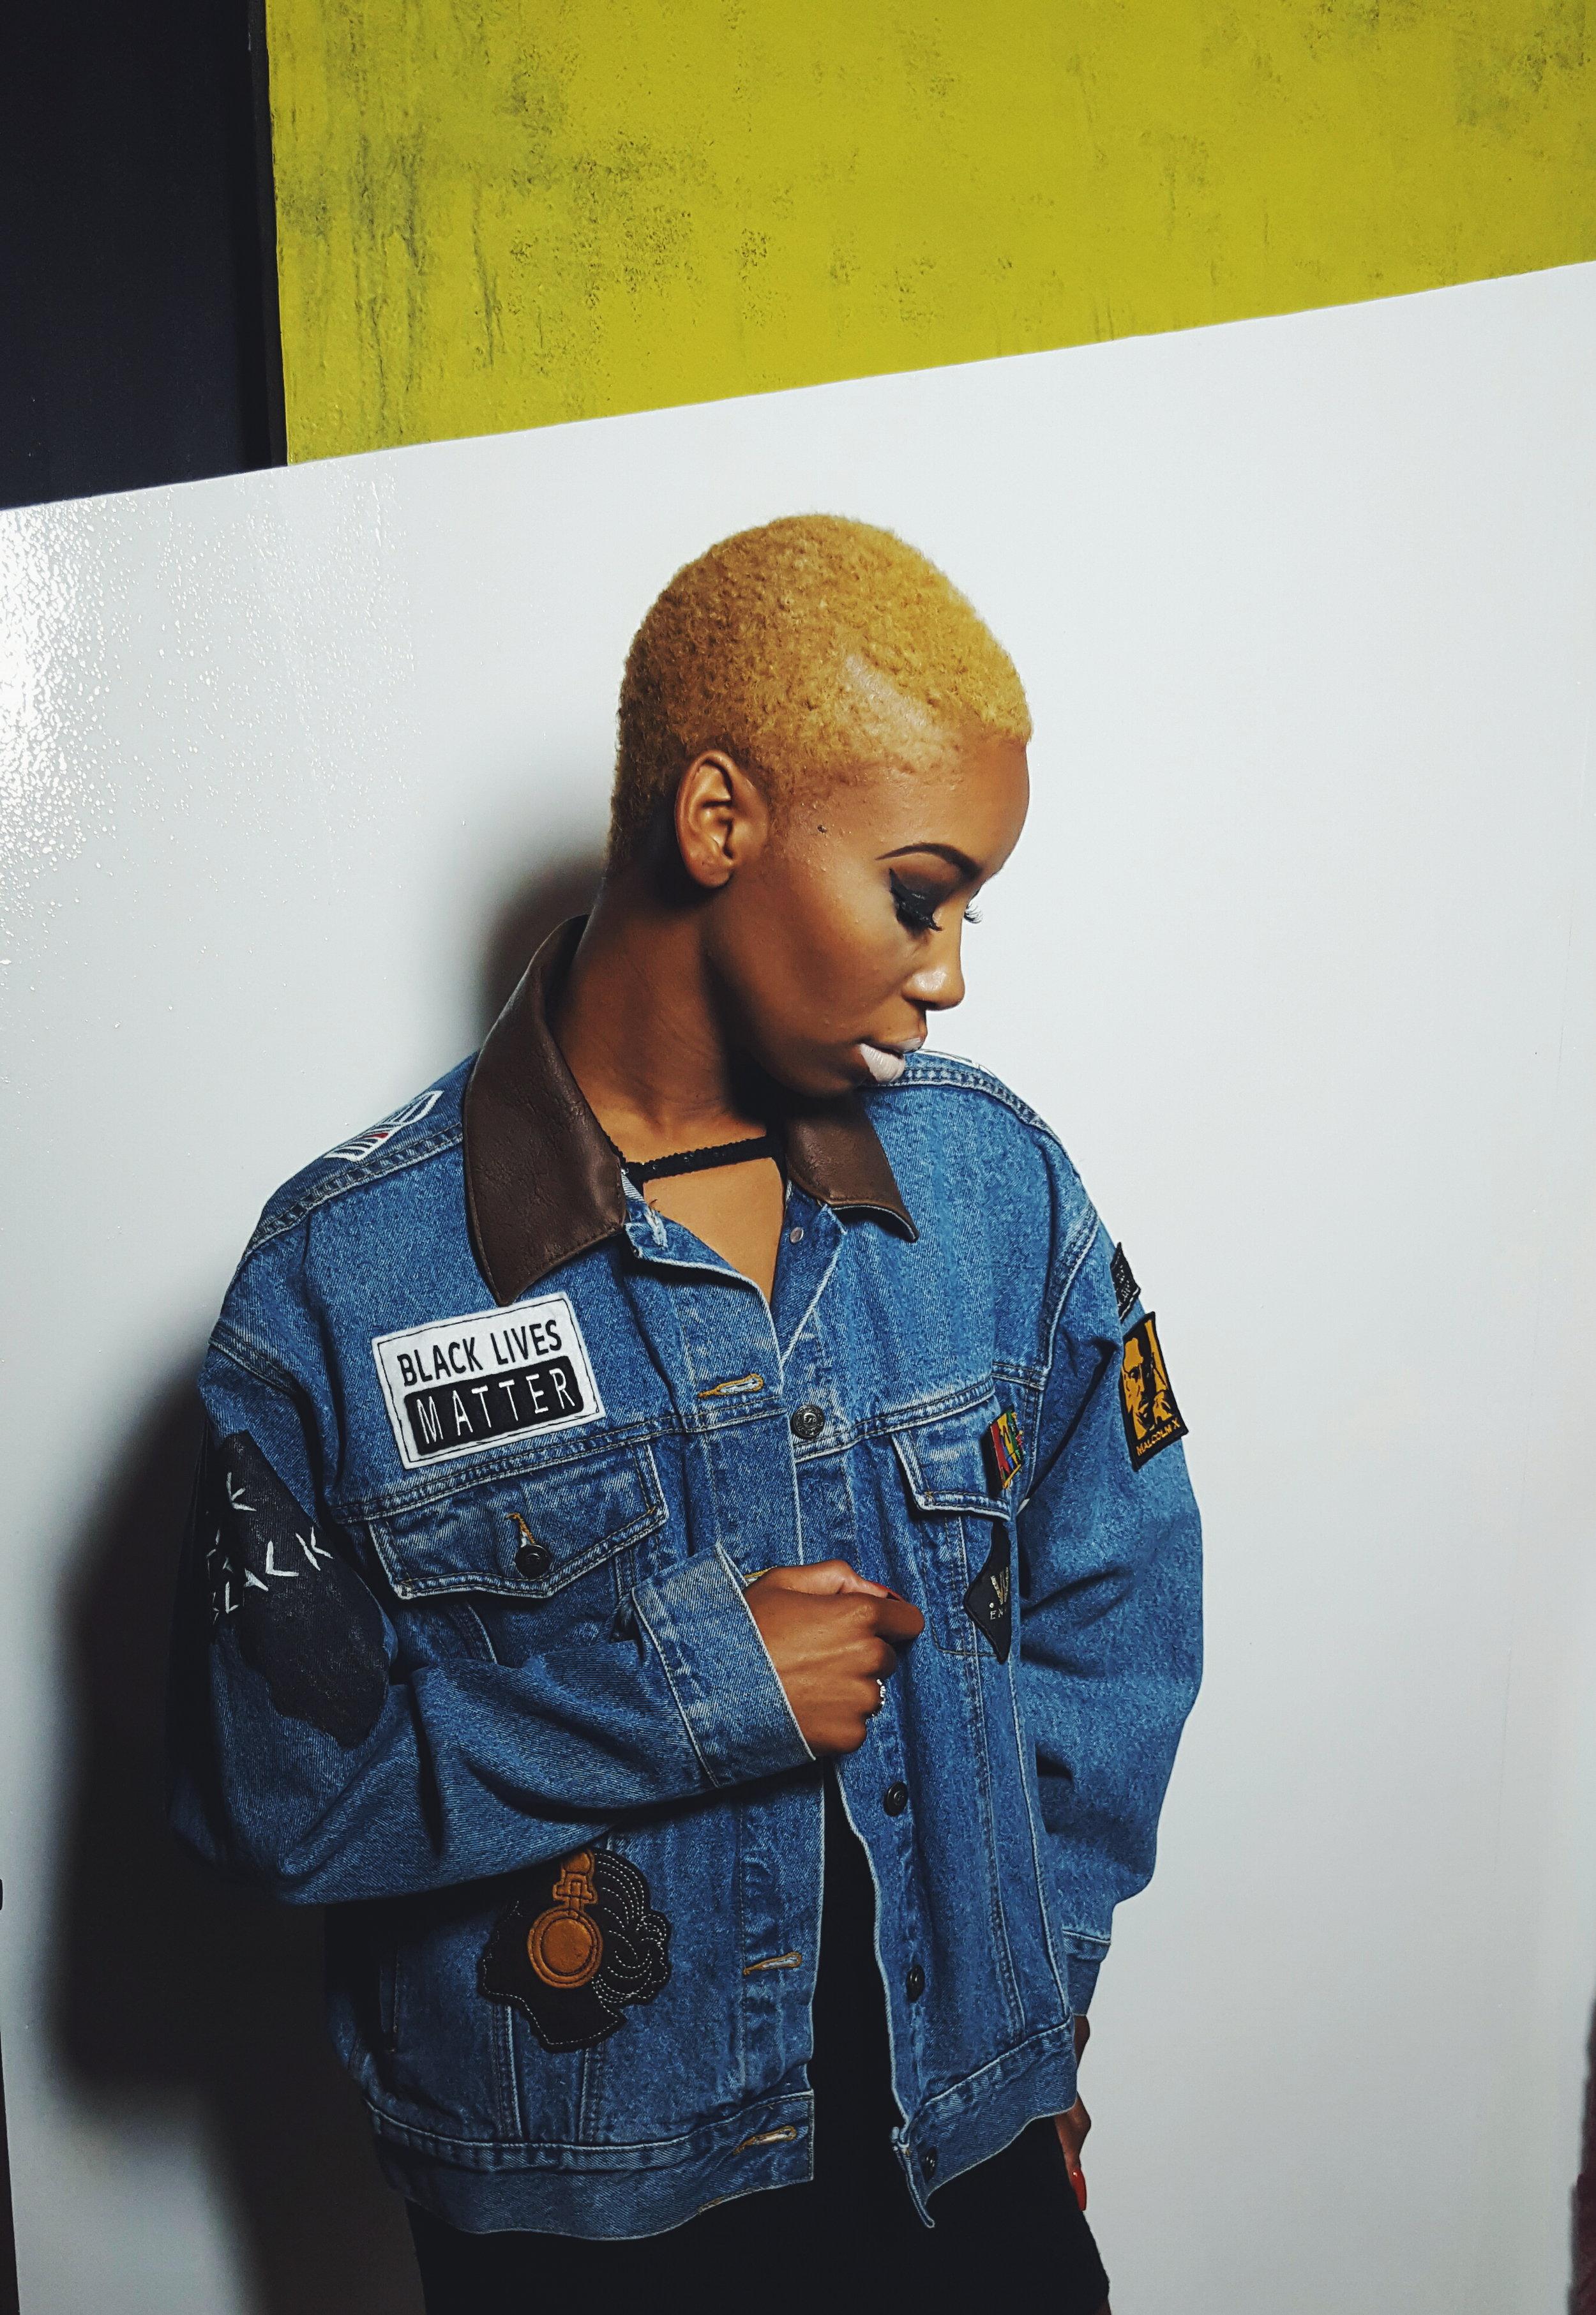 Nastashia Young in the Fade to Black original